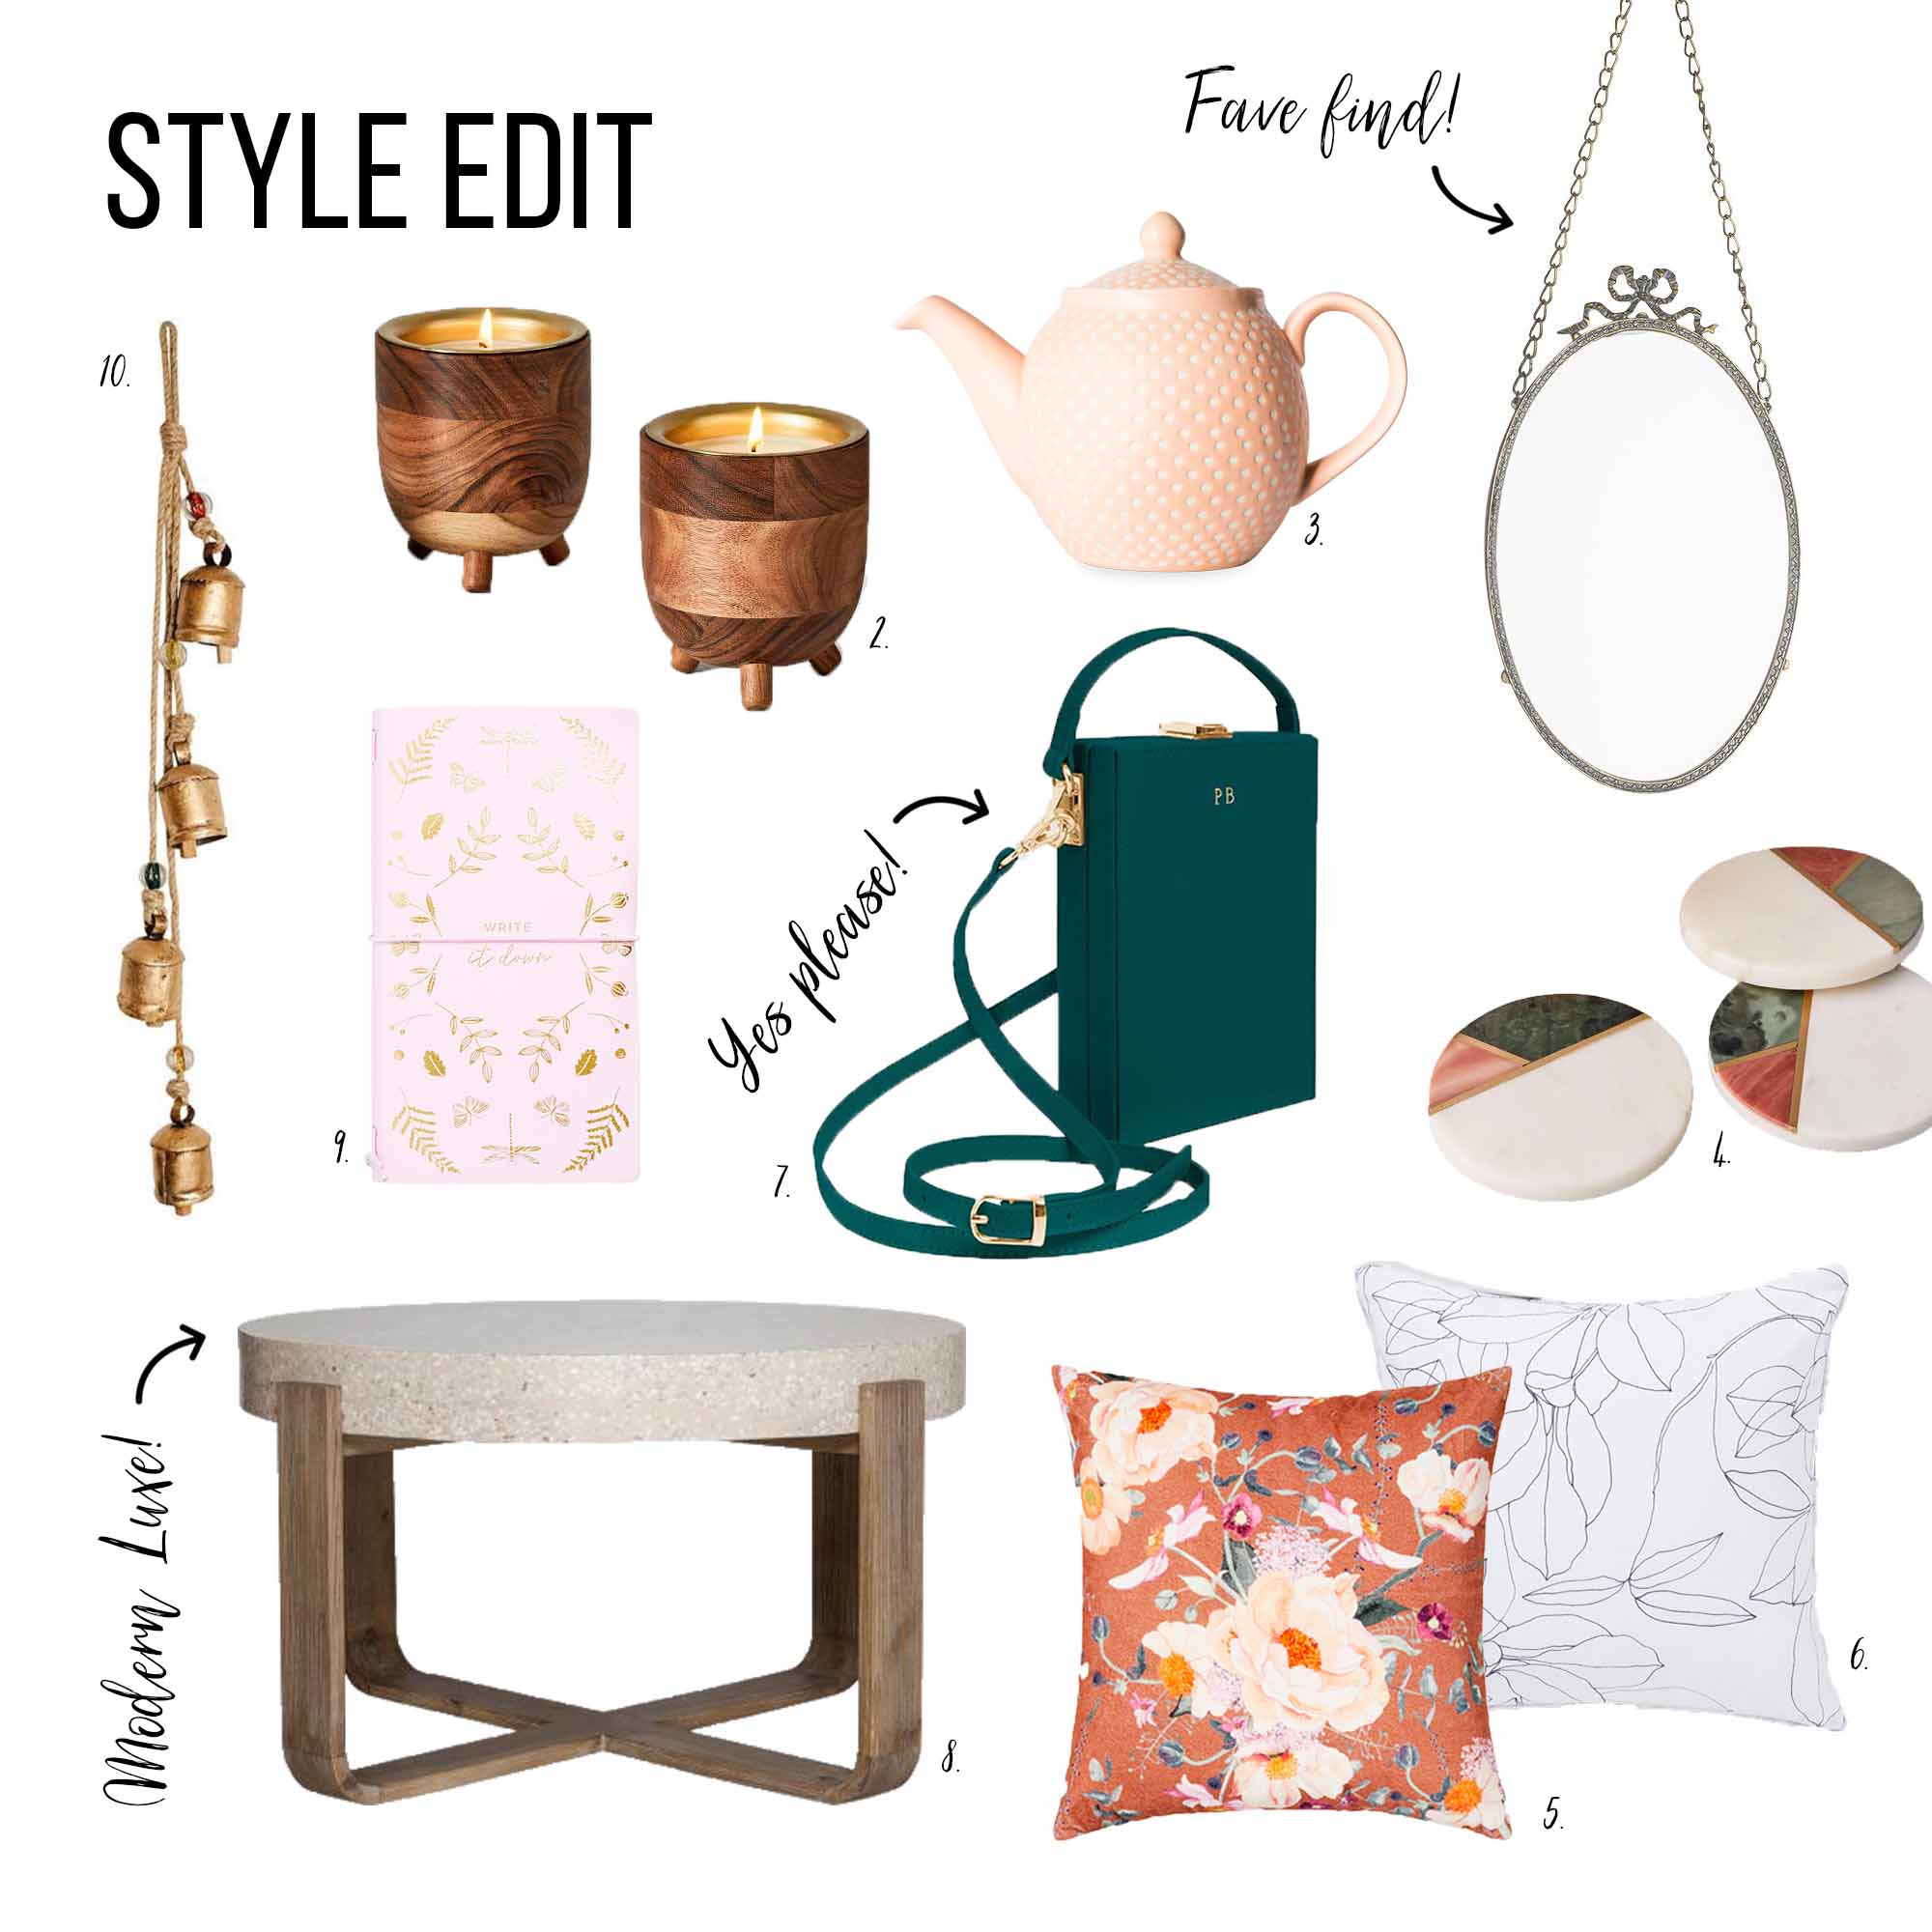 Style Edit February2_Jessica Flood Design.jpg